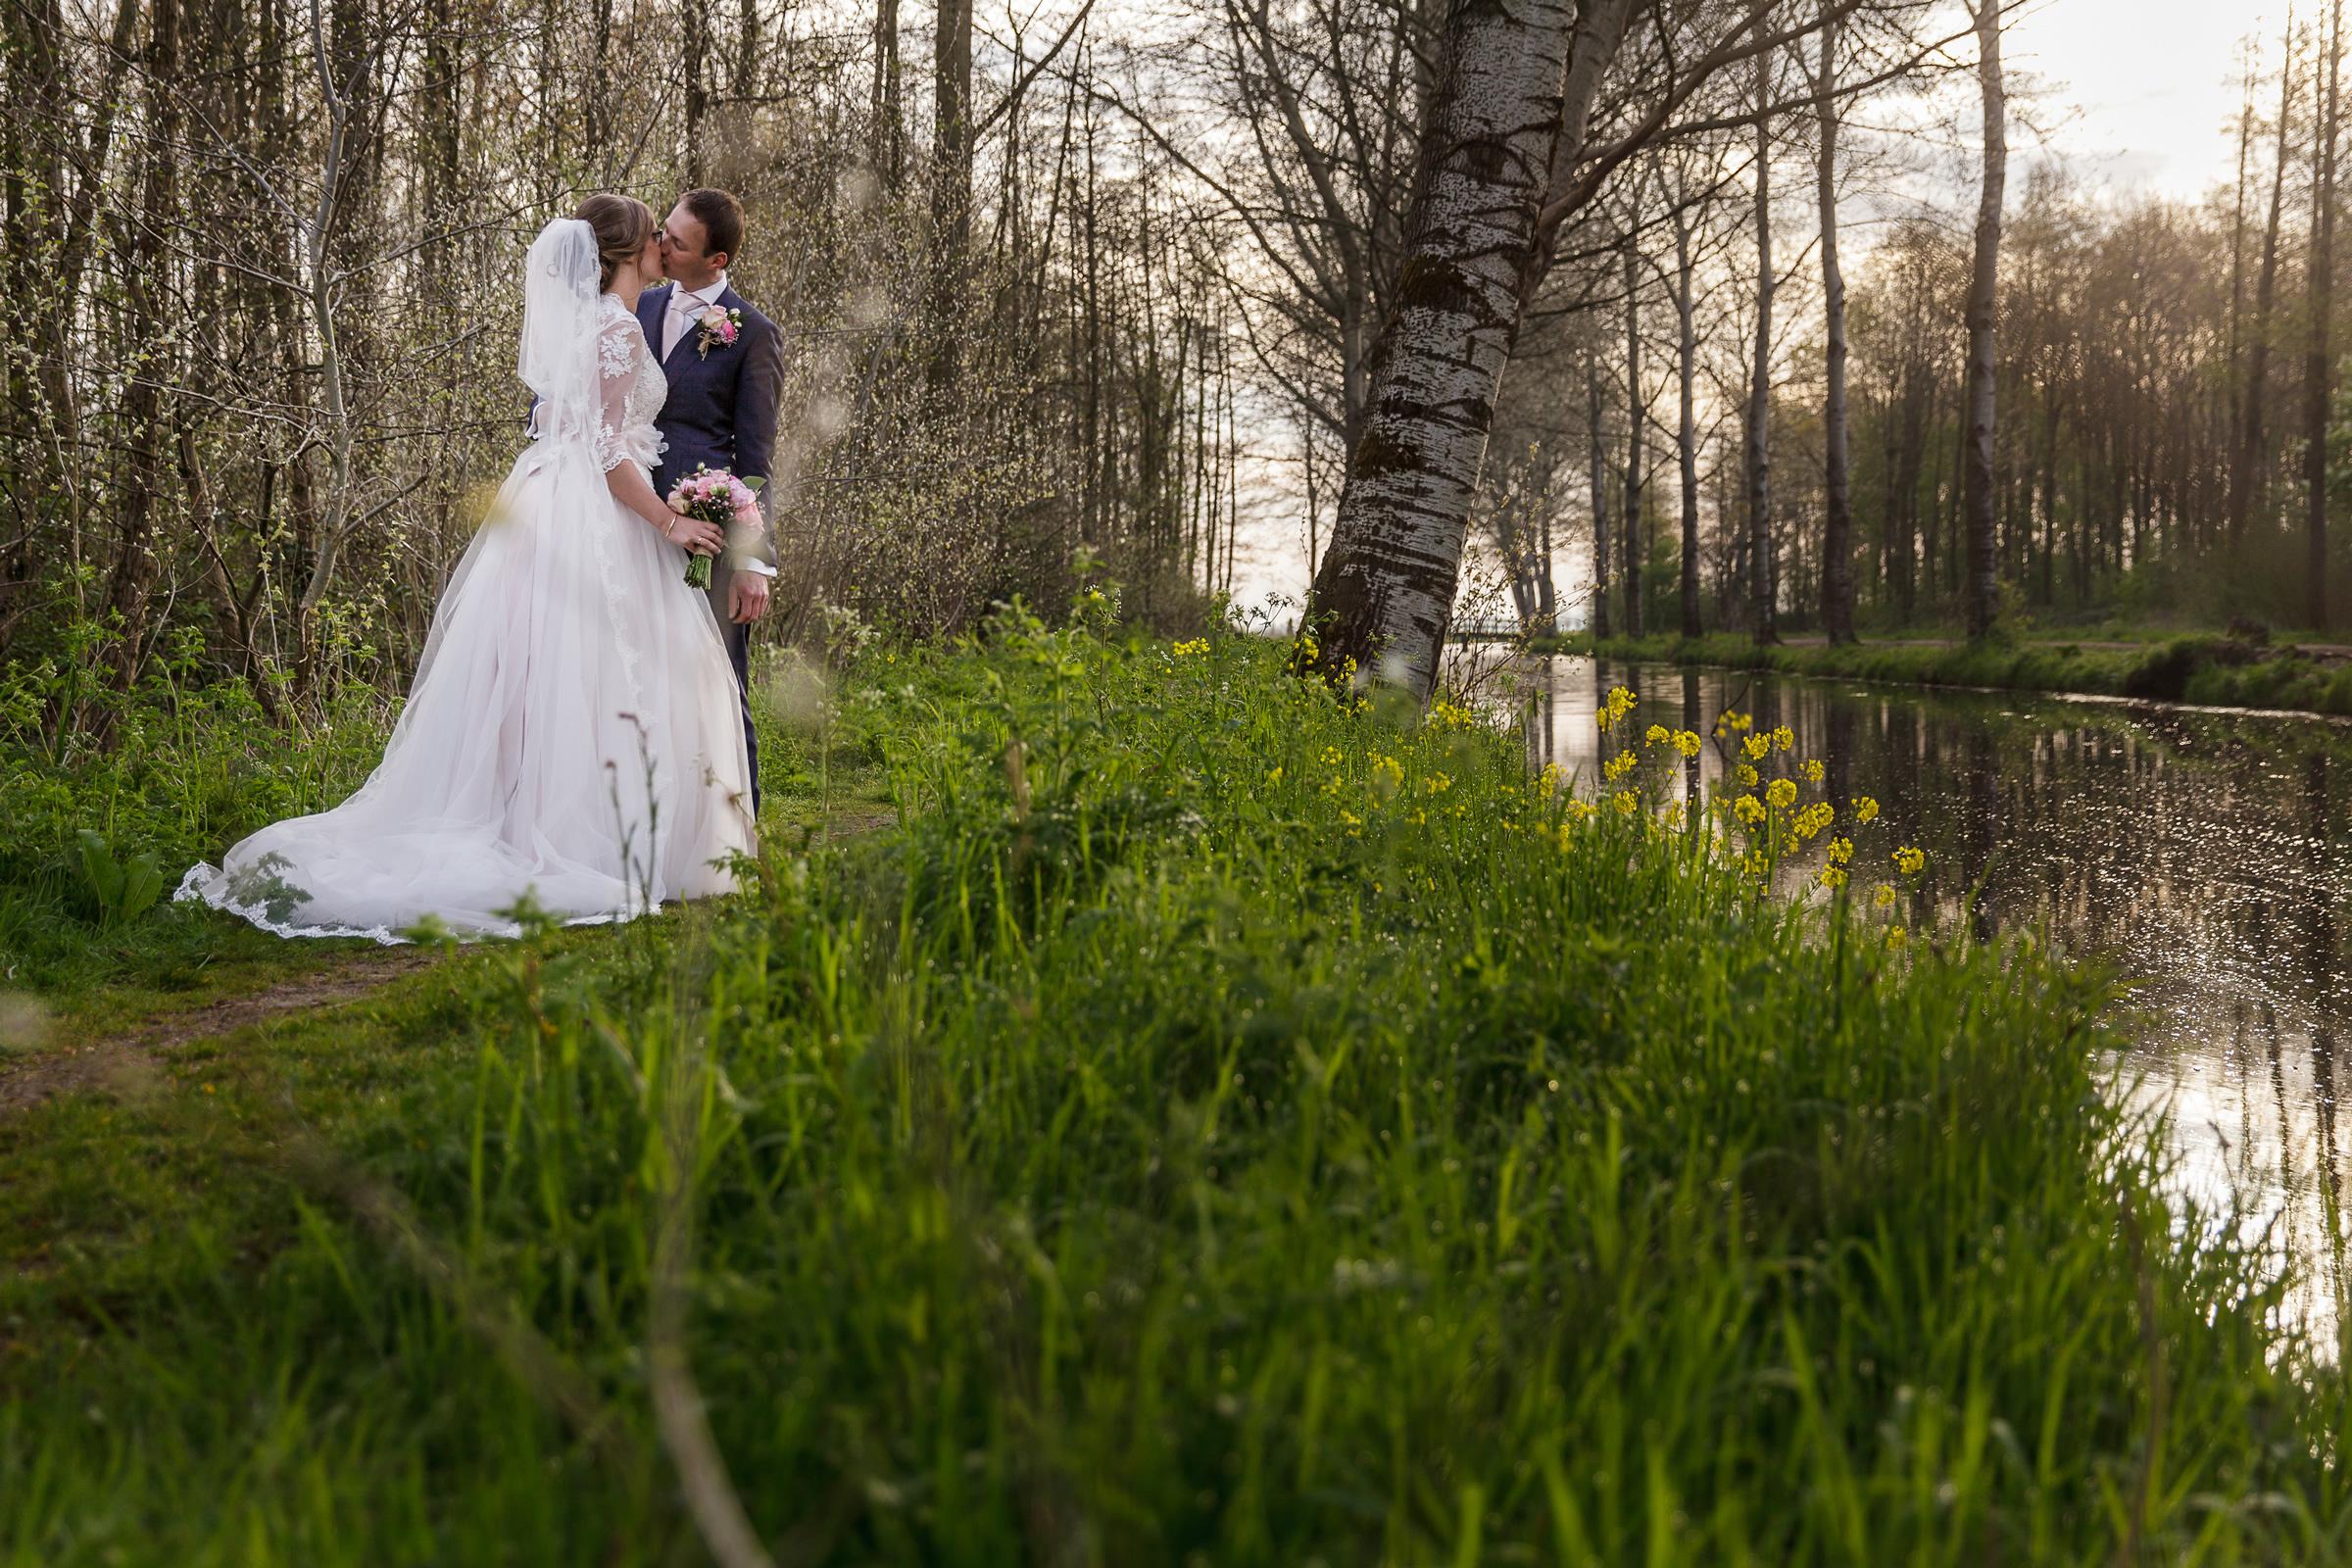 2016 – Cees en Helena – Bruiloft – staande, sloot (ouderboekje foto) – 3